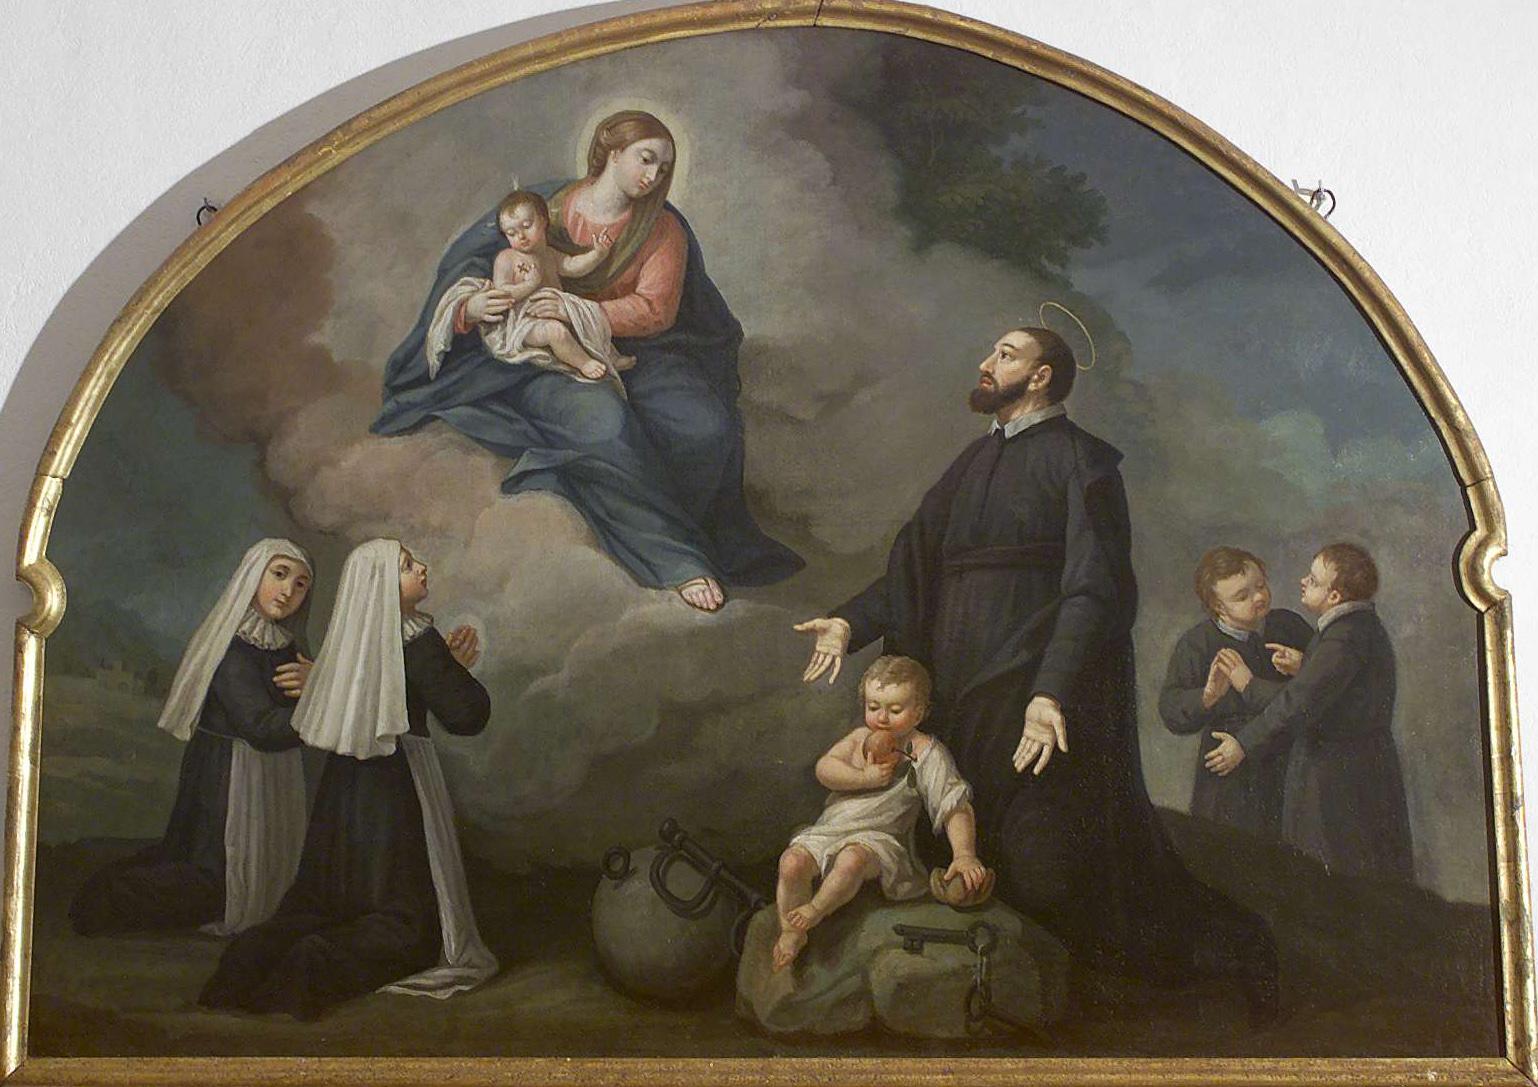 La Madre de los Huérfanos se Apareció para Liberar a San Jerónimo Emiliani (27 sep, 8 feb)